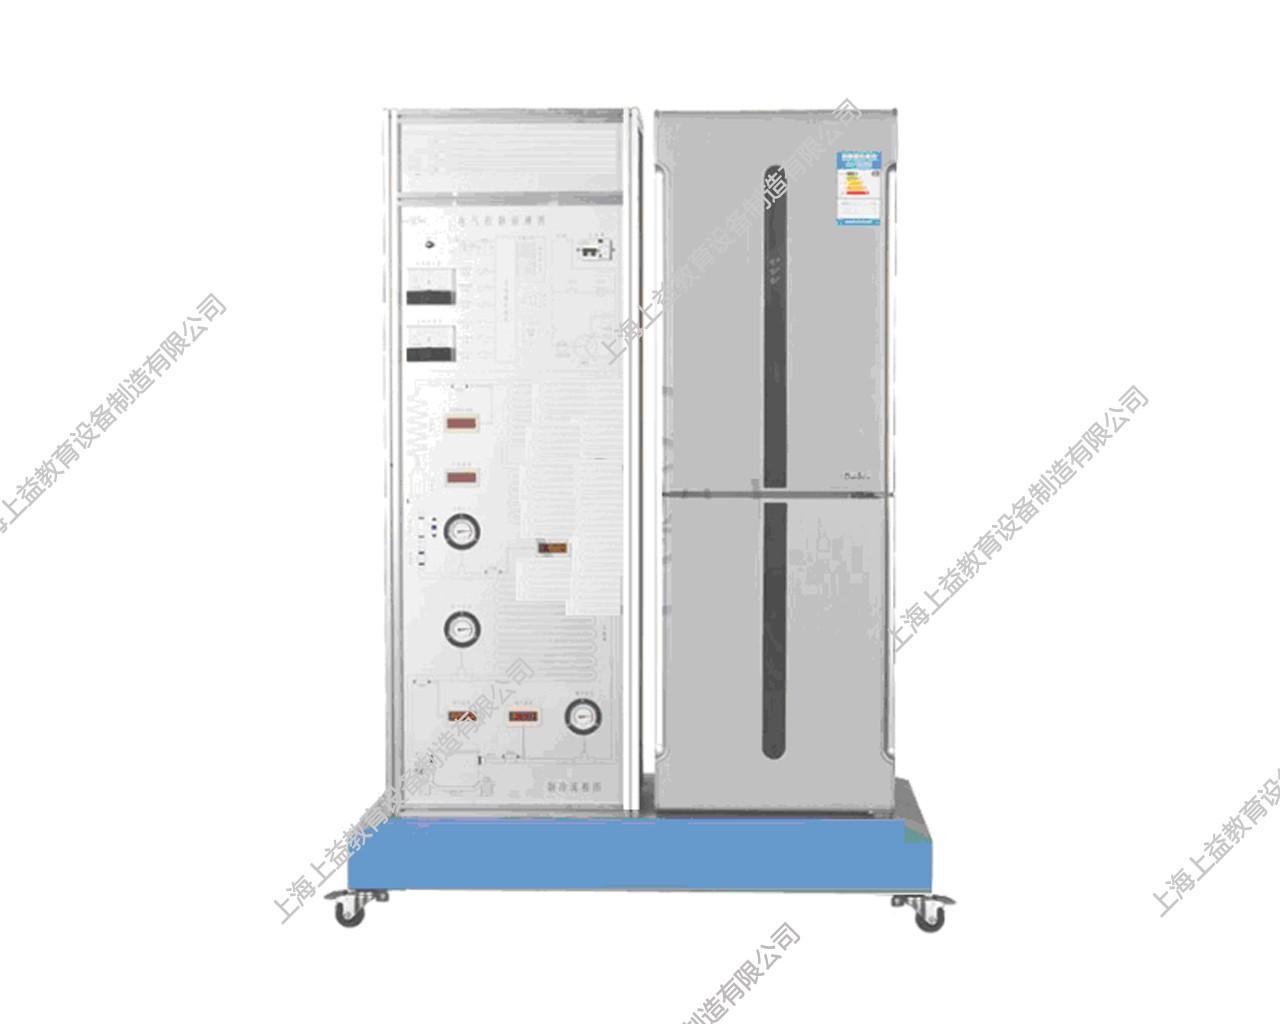 SYZLRX-01A型 电冰箱制冷系统wwwlehu8viplehu68vip装置(直冷式)